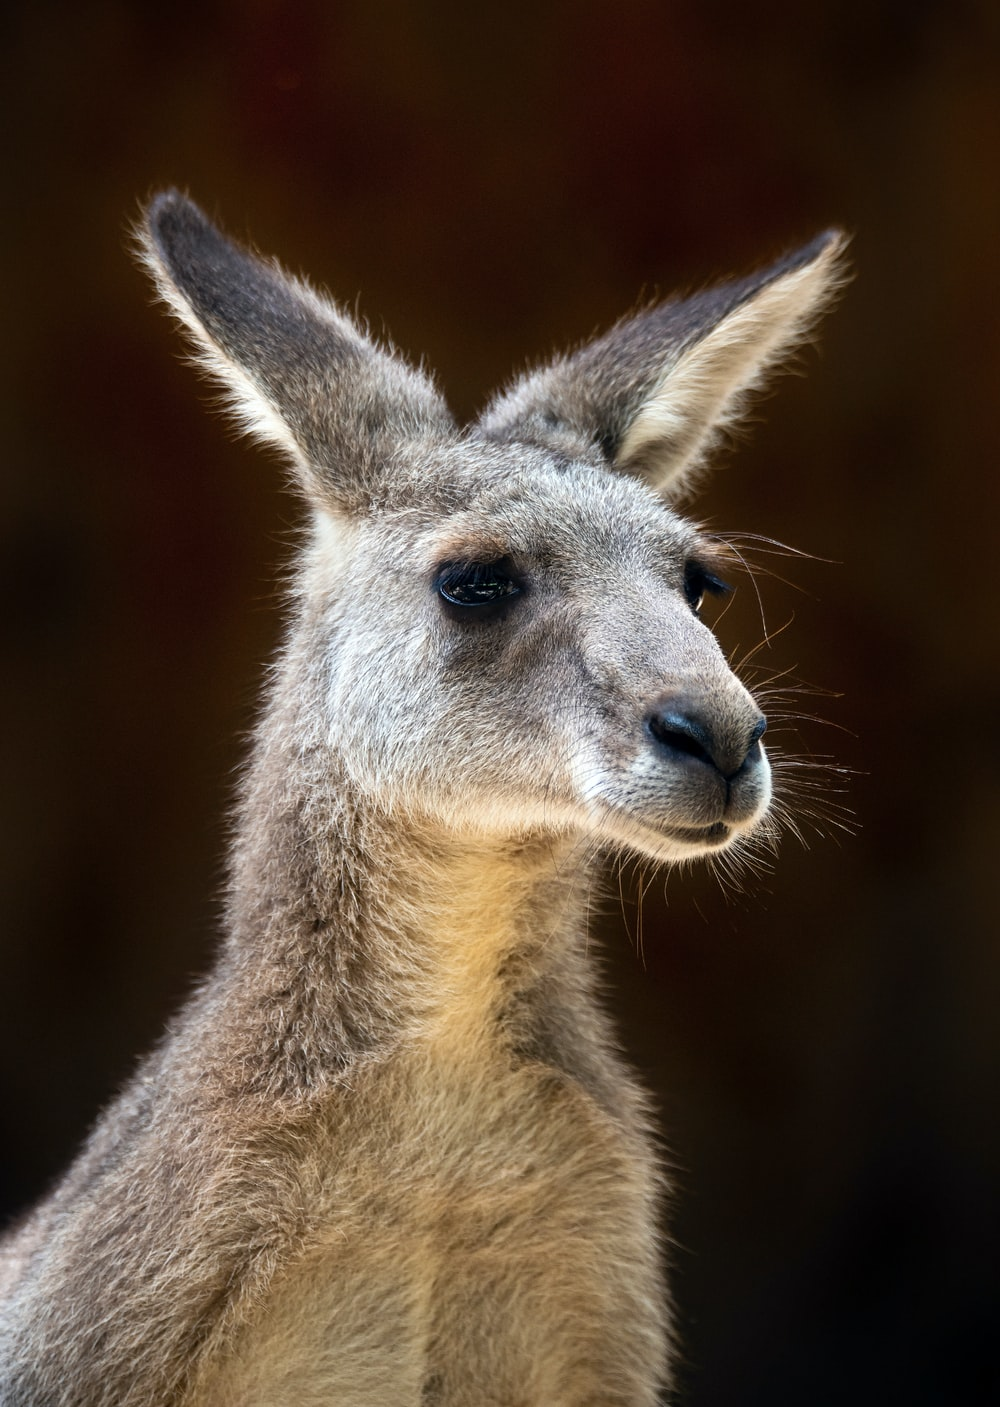 brown kangaroo in close up photography